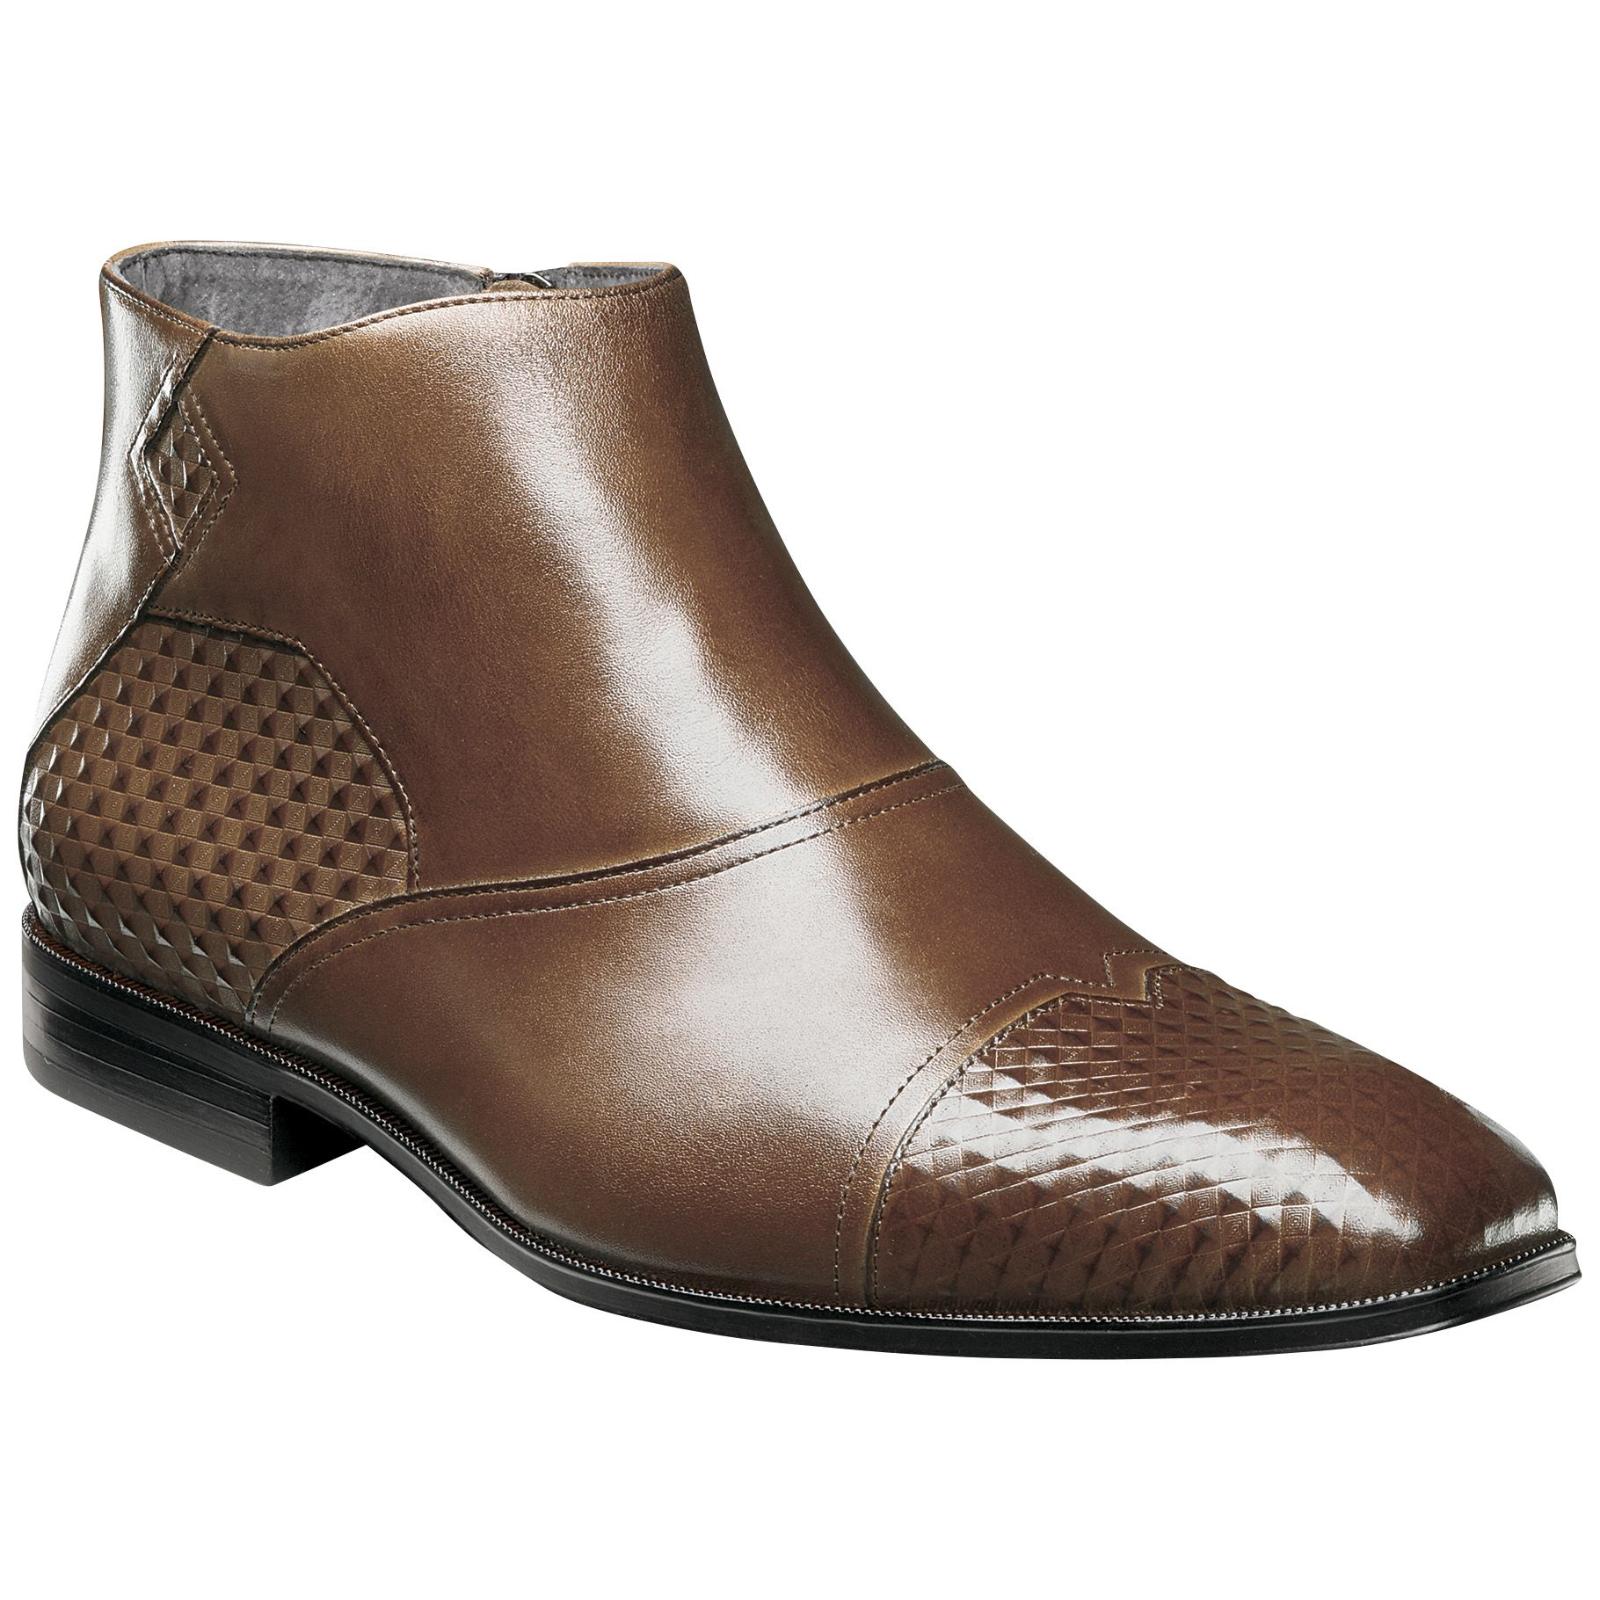 Stacy Adams Mens Faramond Boot Cognac Size 13  NJBOE-413